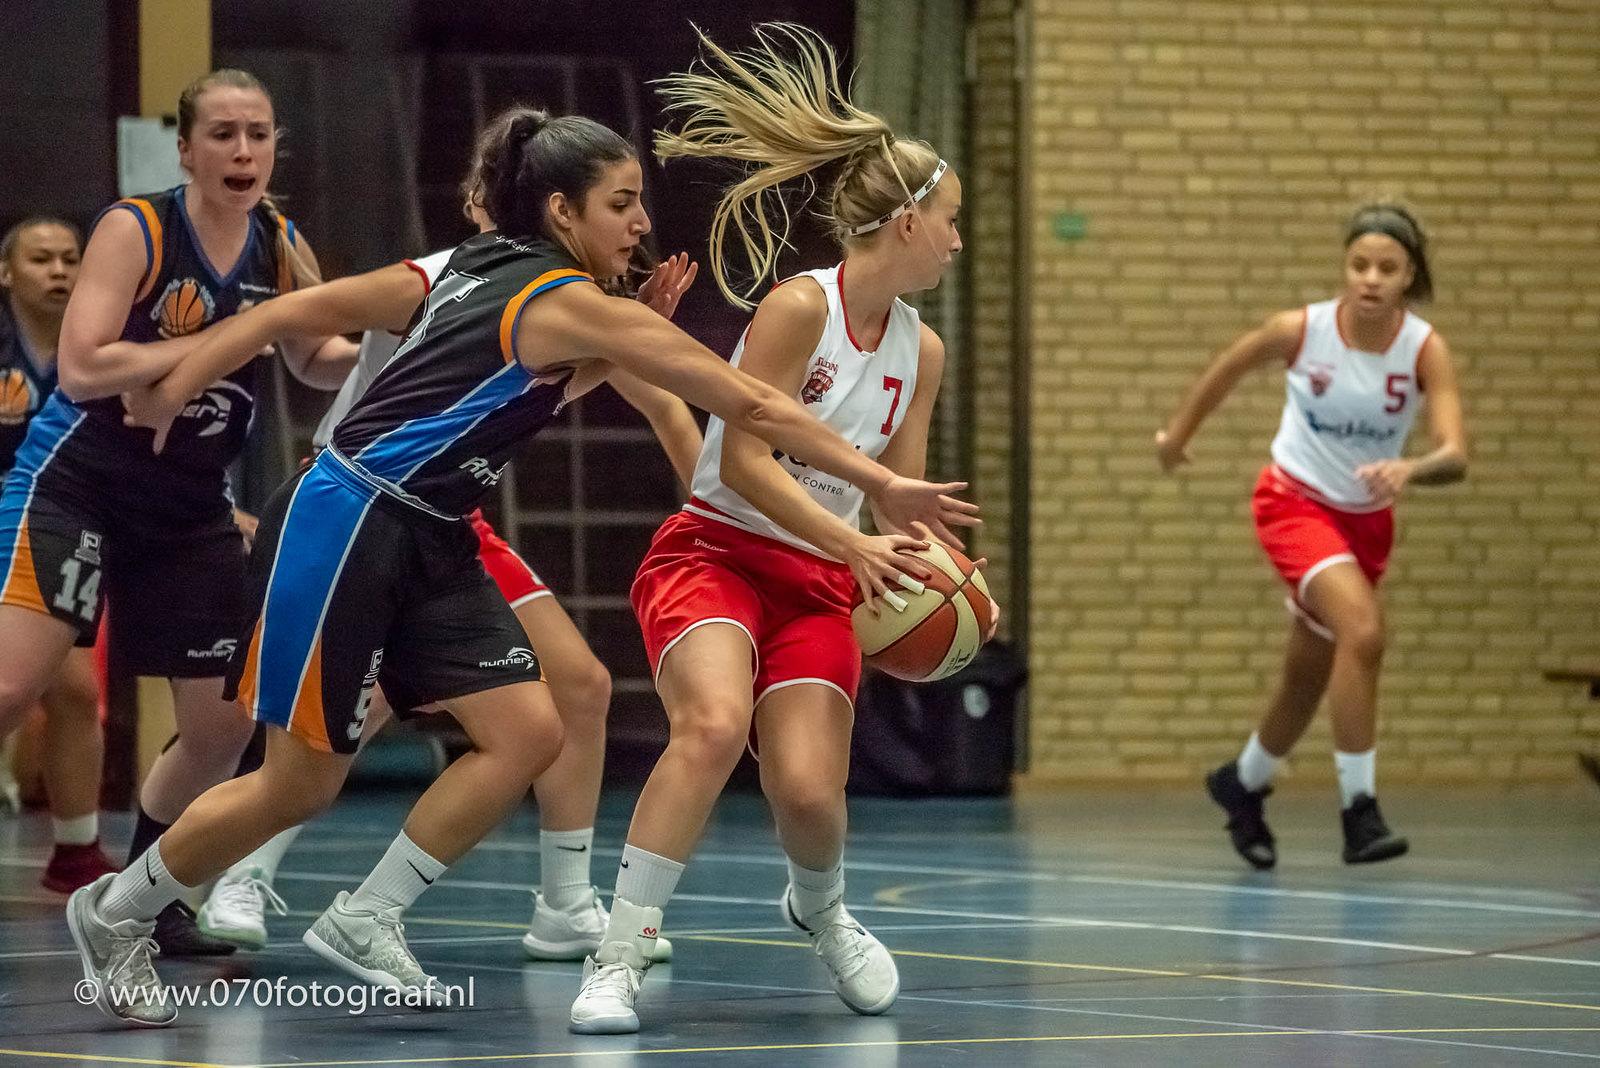 Basketball: 2018-12-16 Lokomotief VSE 1 – CobraNova VSE 1 [47-70]